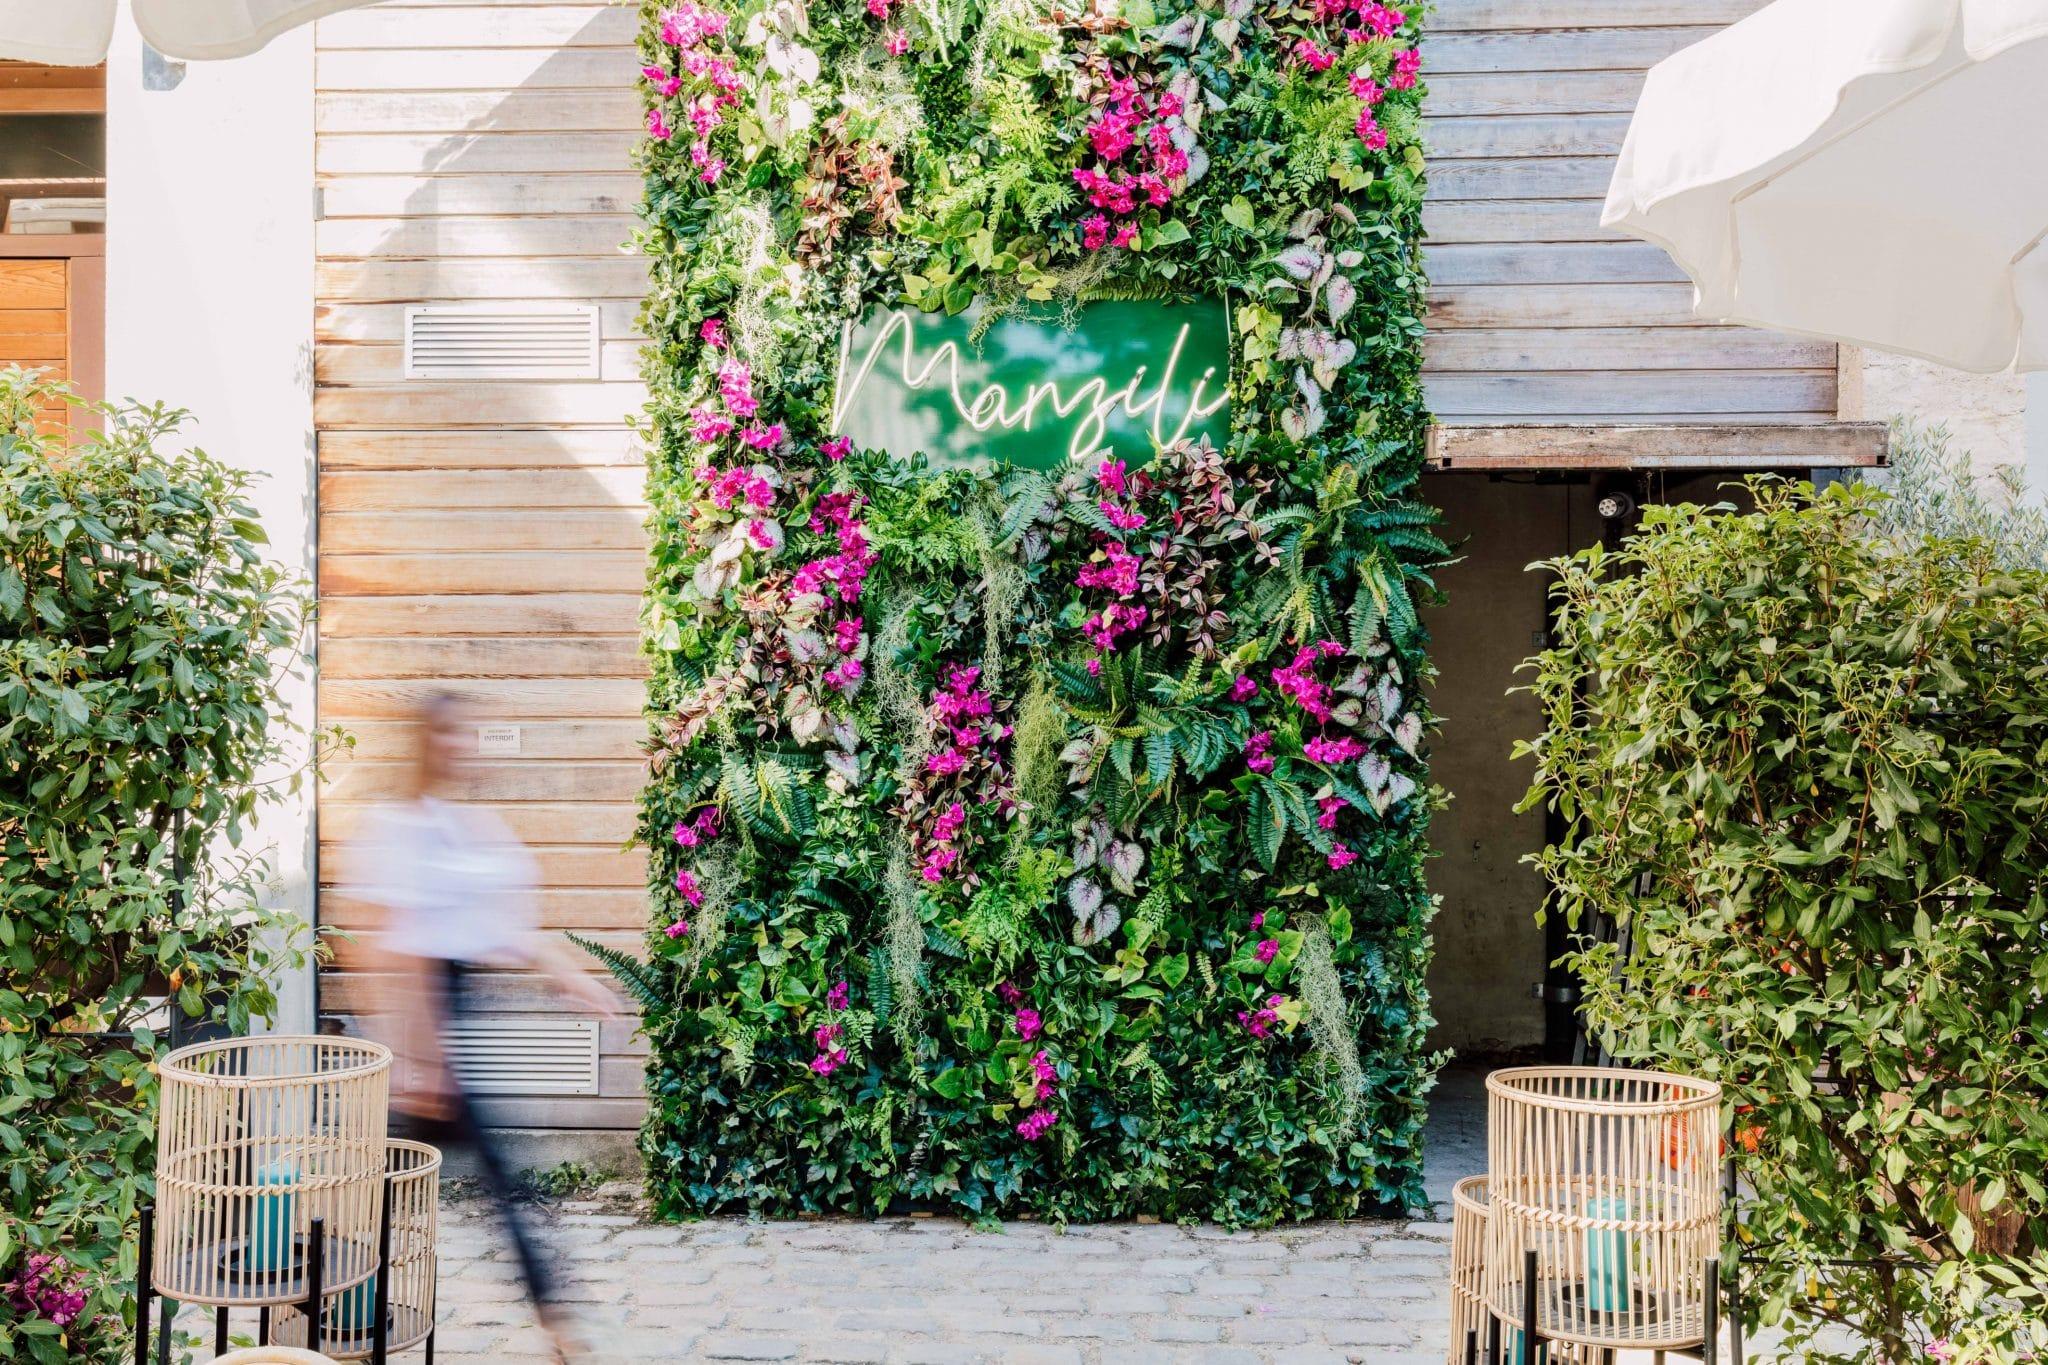 manzili mur floral végétal restaurant éphémère paris terrasse top chef mohammed cheikh